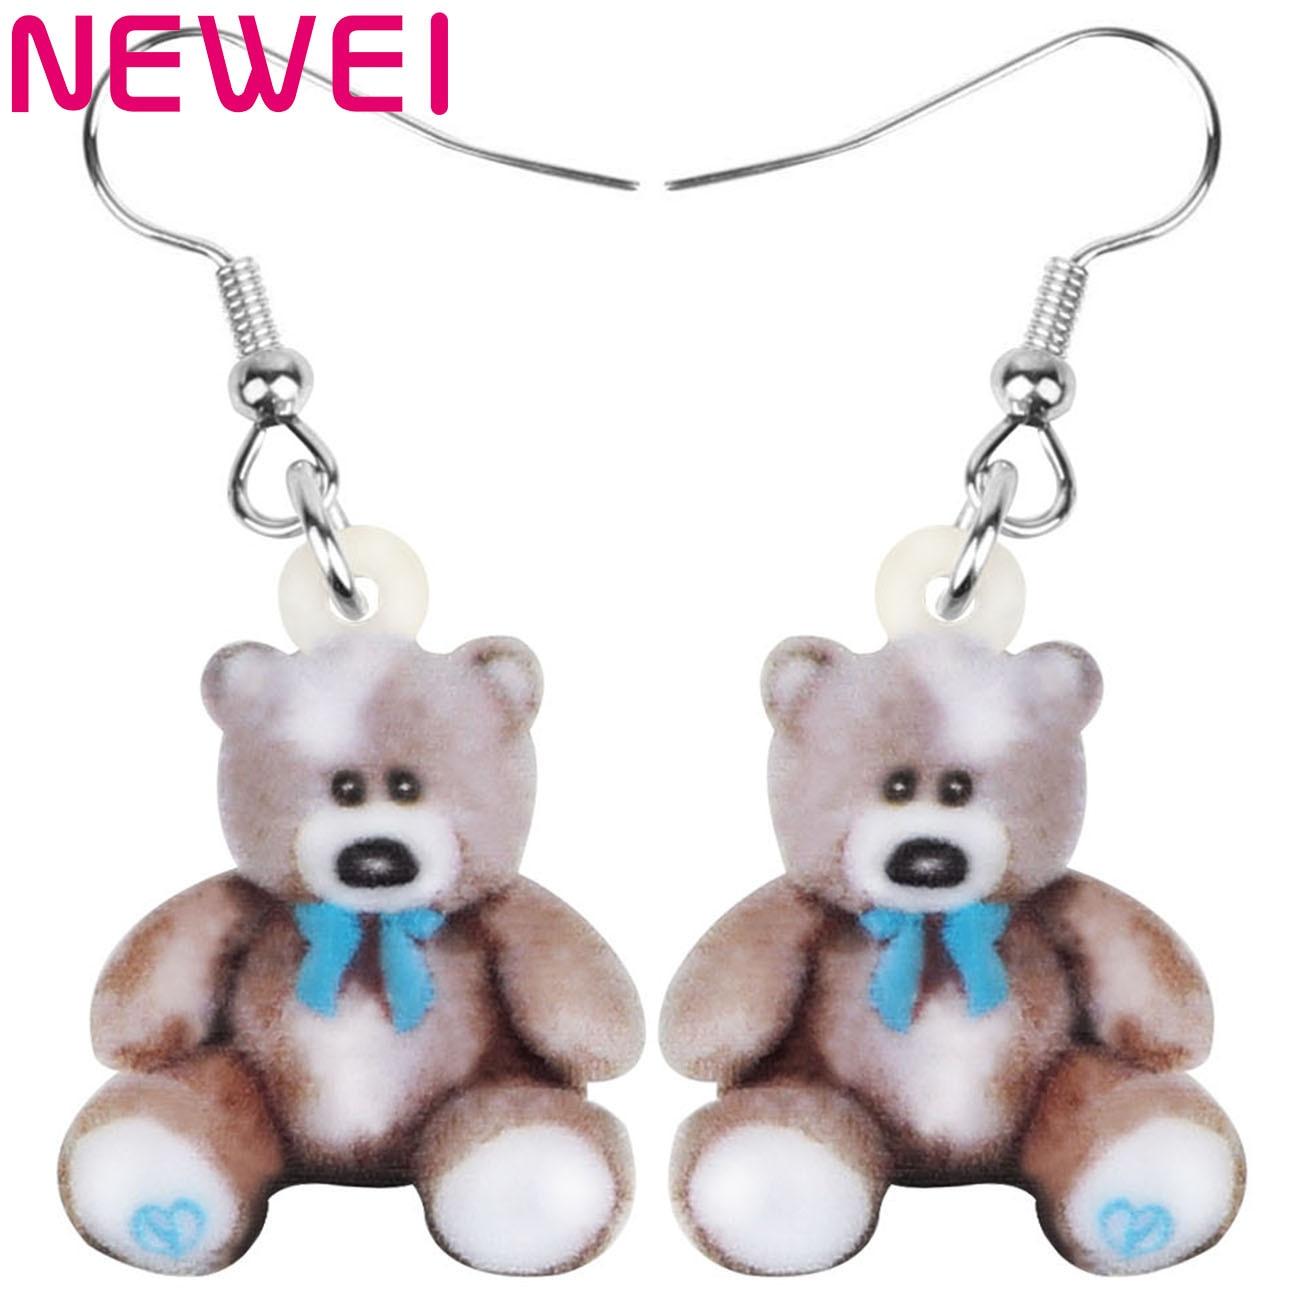 Newei Acrylic Brown Plush Teddy Bear Earrings Printing Realistic Cute Animal Dangle Drop For Women Girls Vintage Gift Jewelry